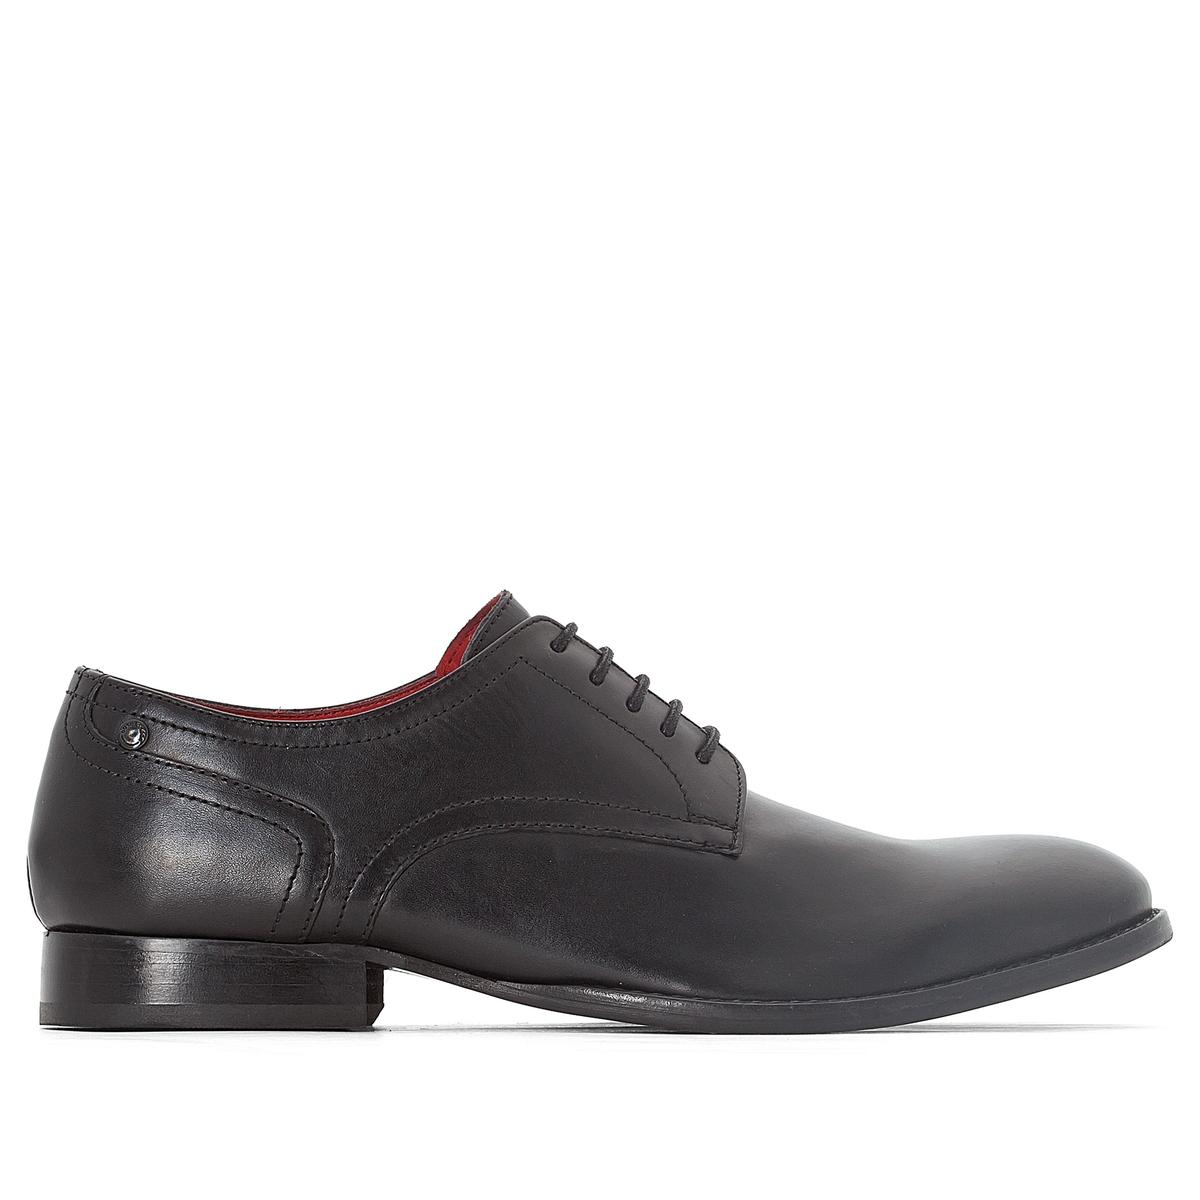 Ботинки-дерби кожаные FORD ботинки дерби кожаные